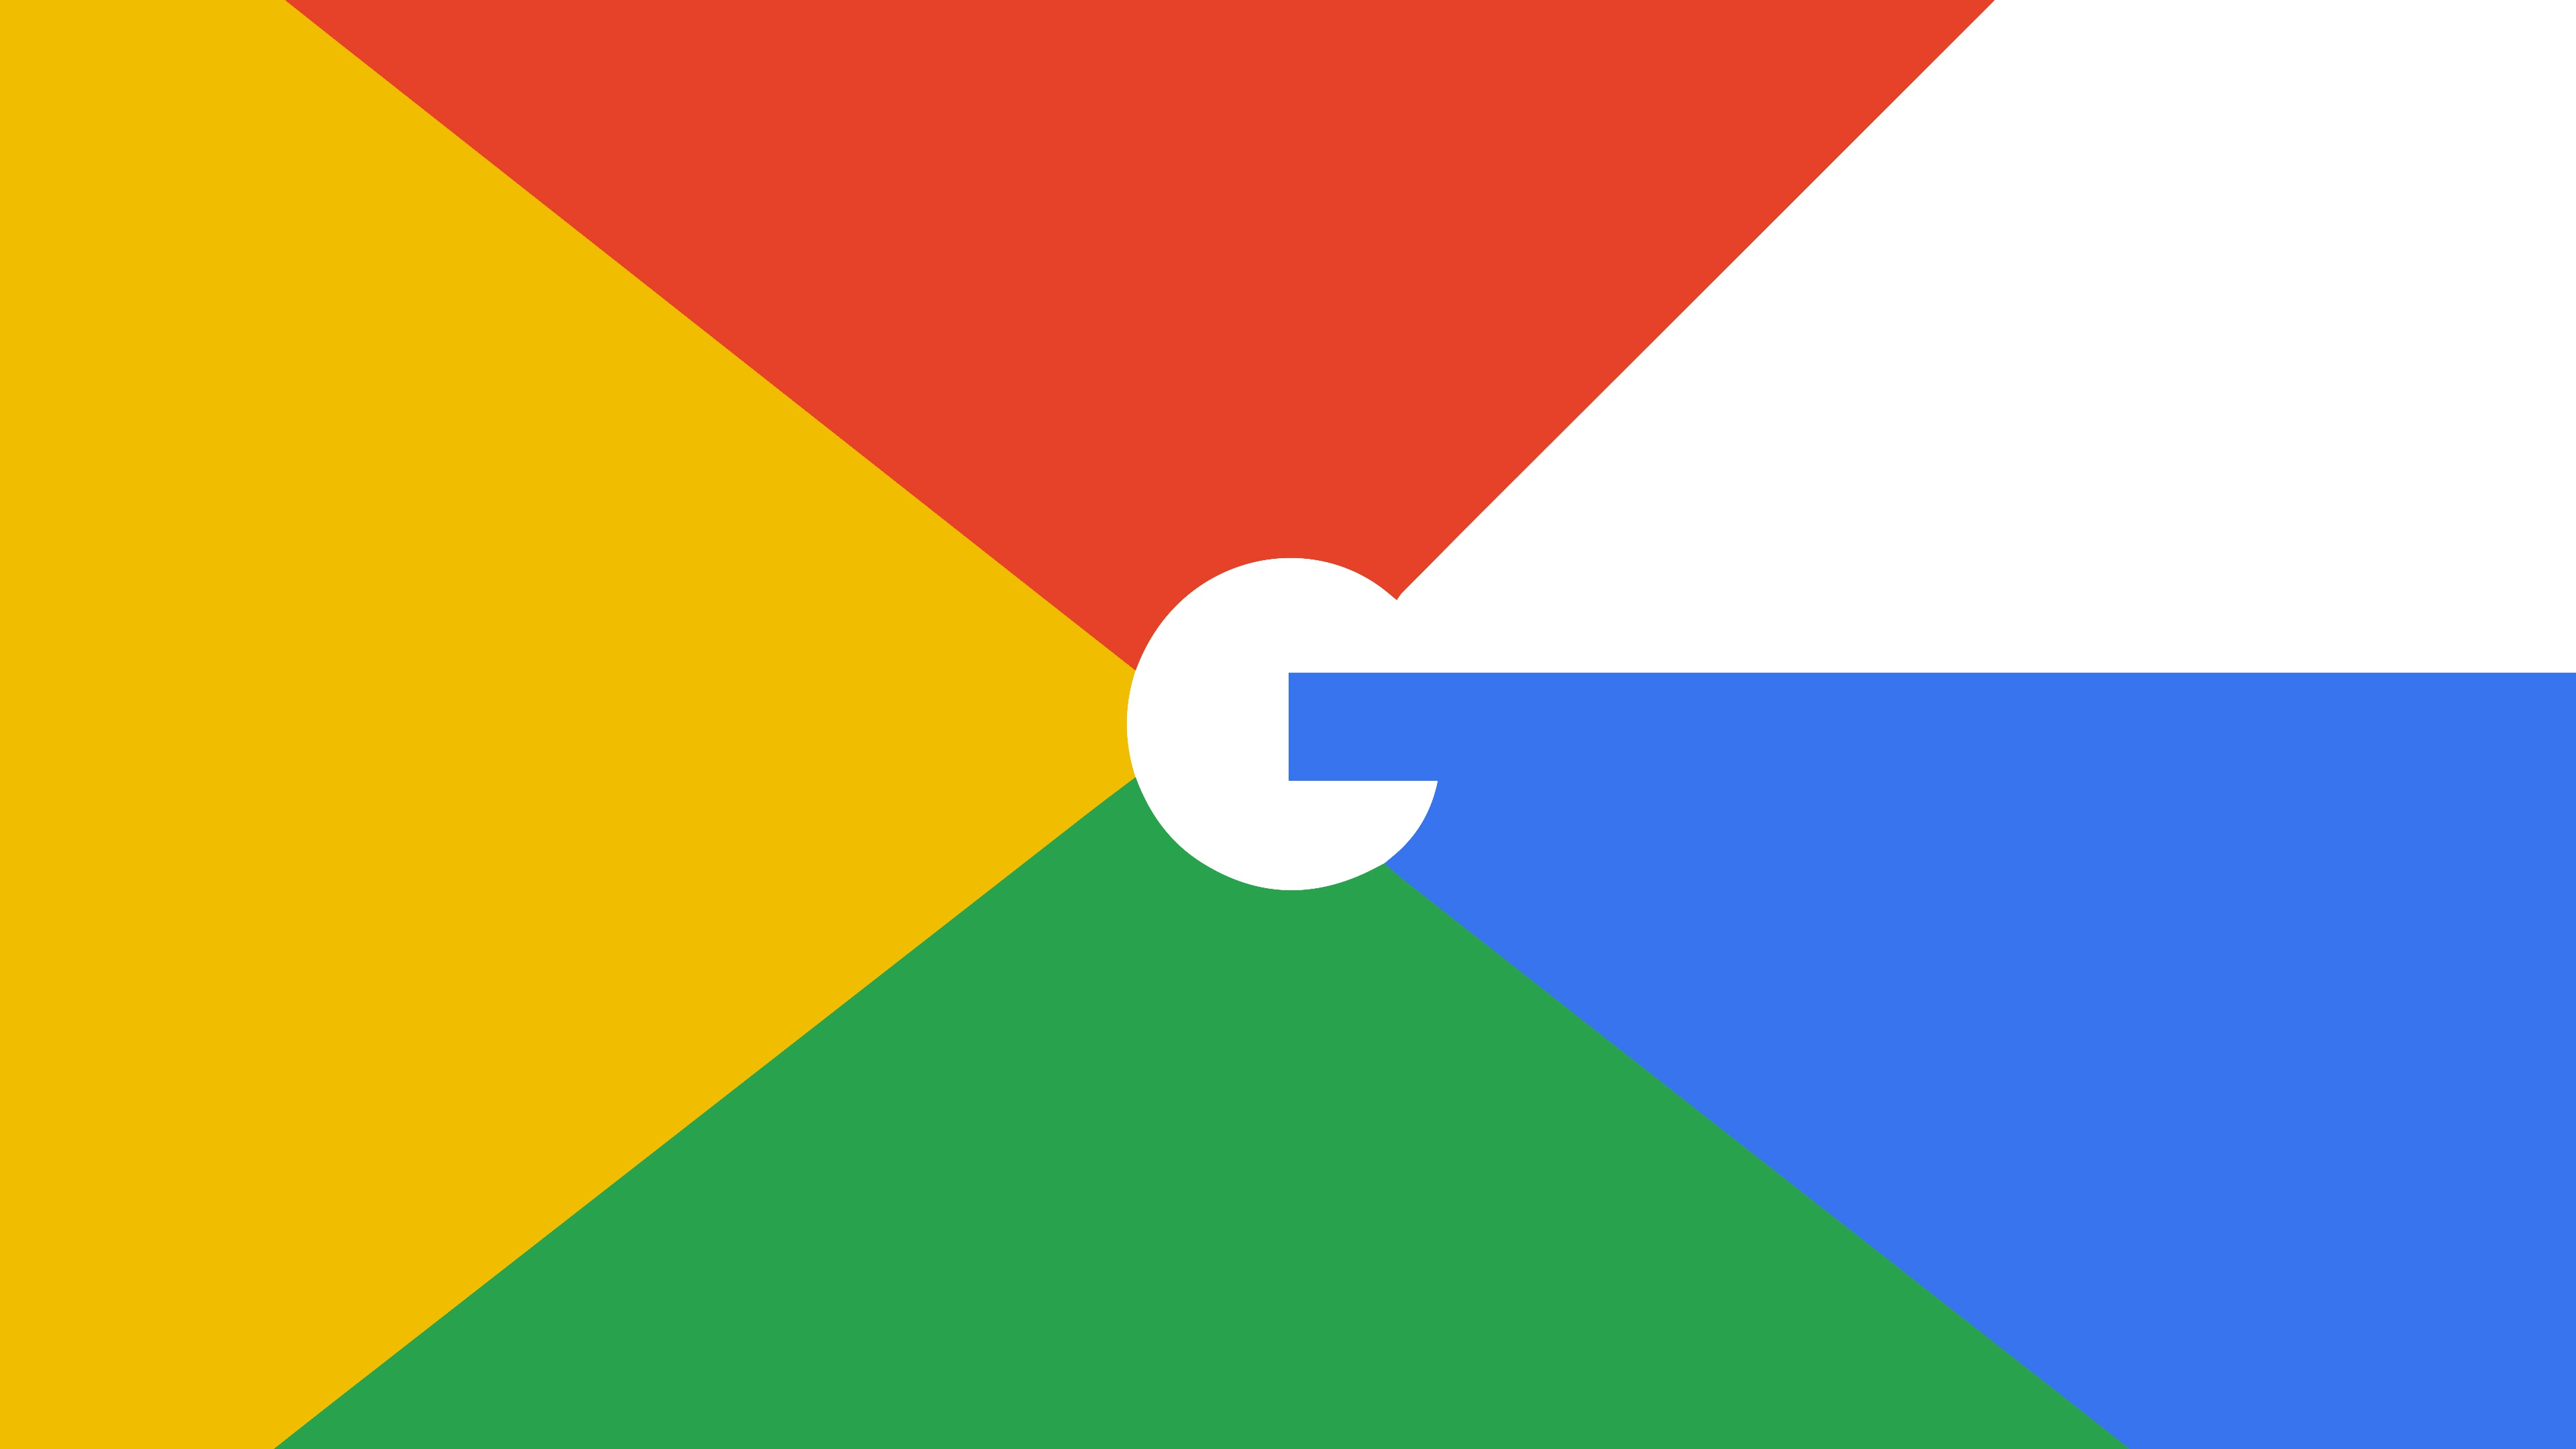 2560x1700 Google Logo Minimalism 4k Chromebook Pixel HD 4k